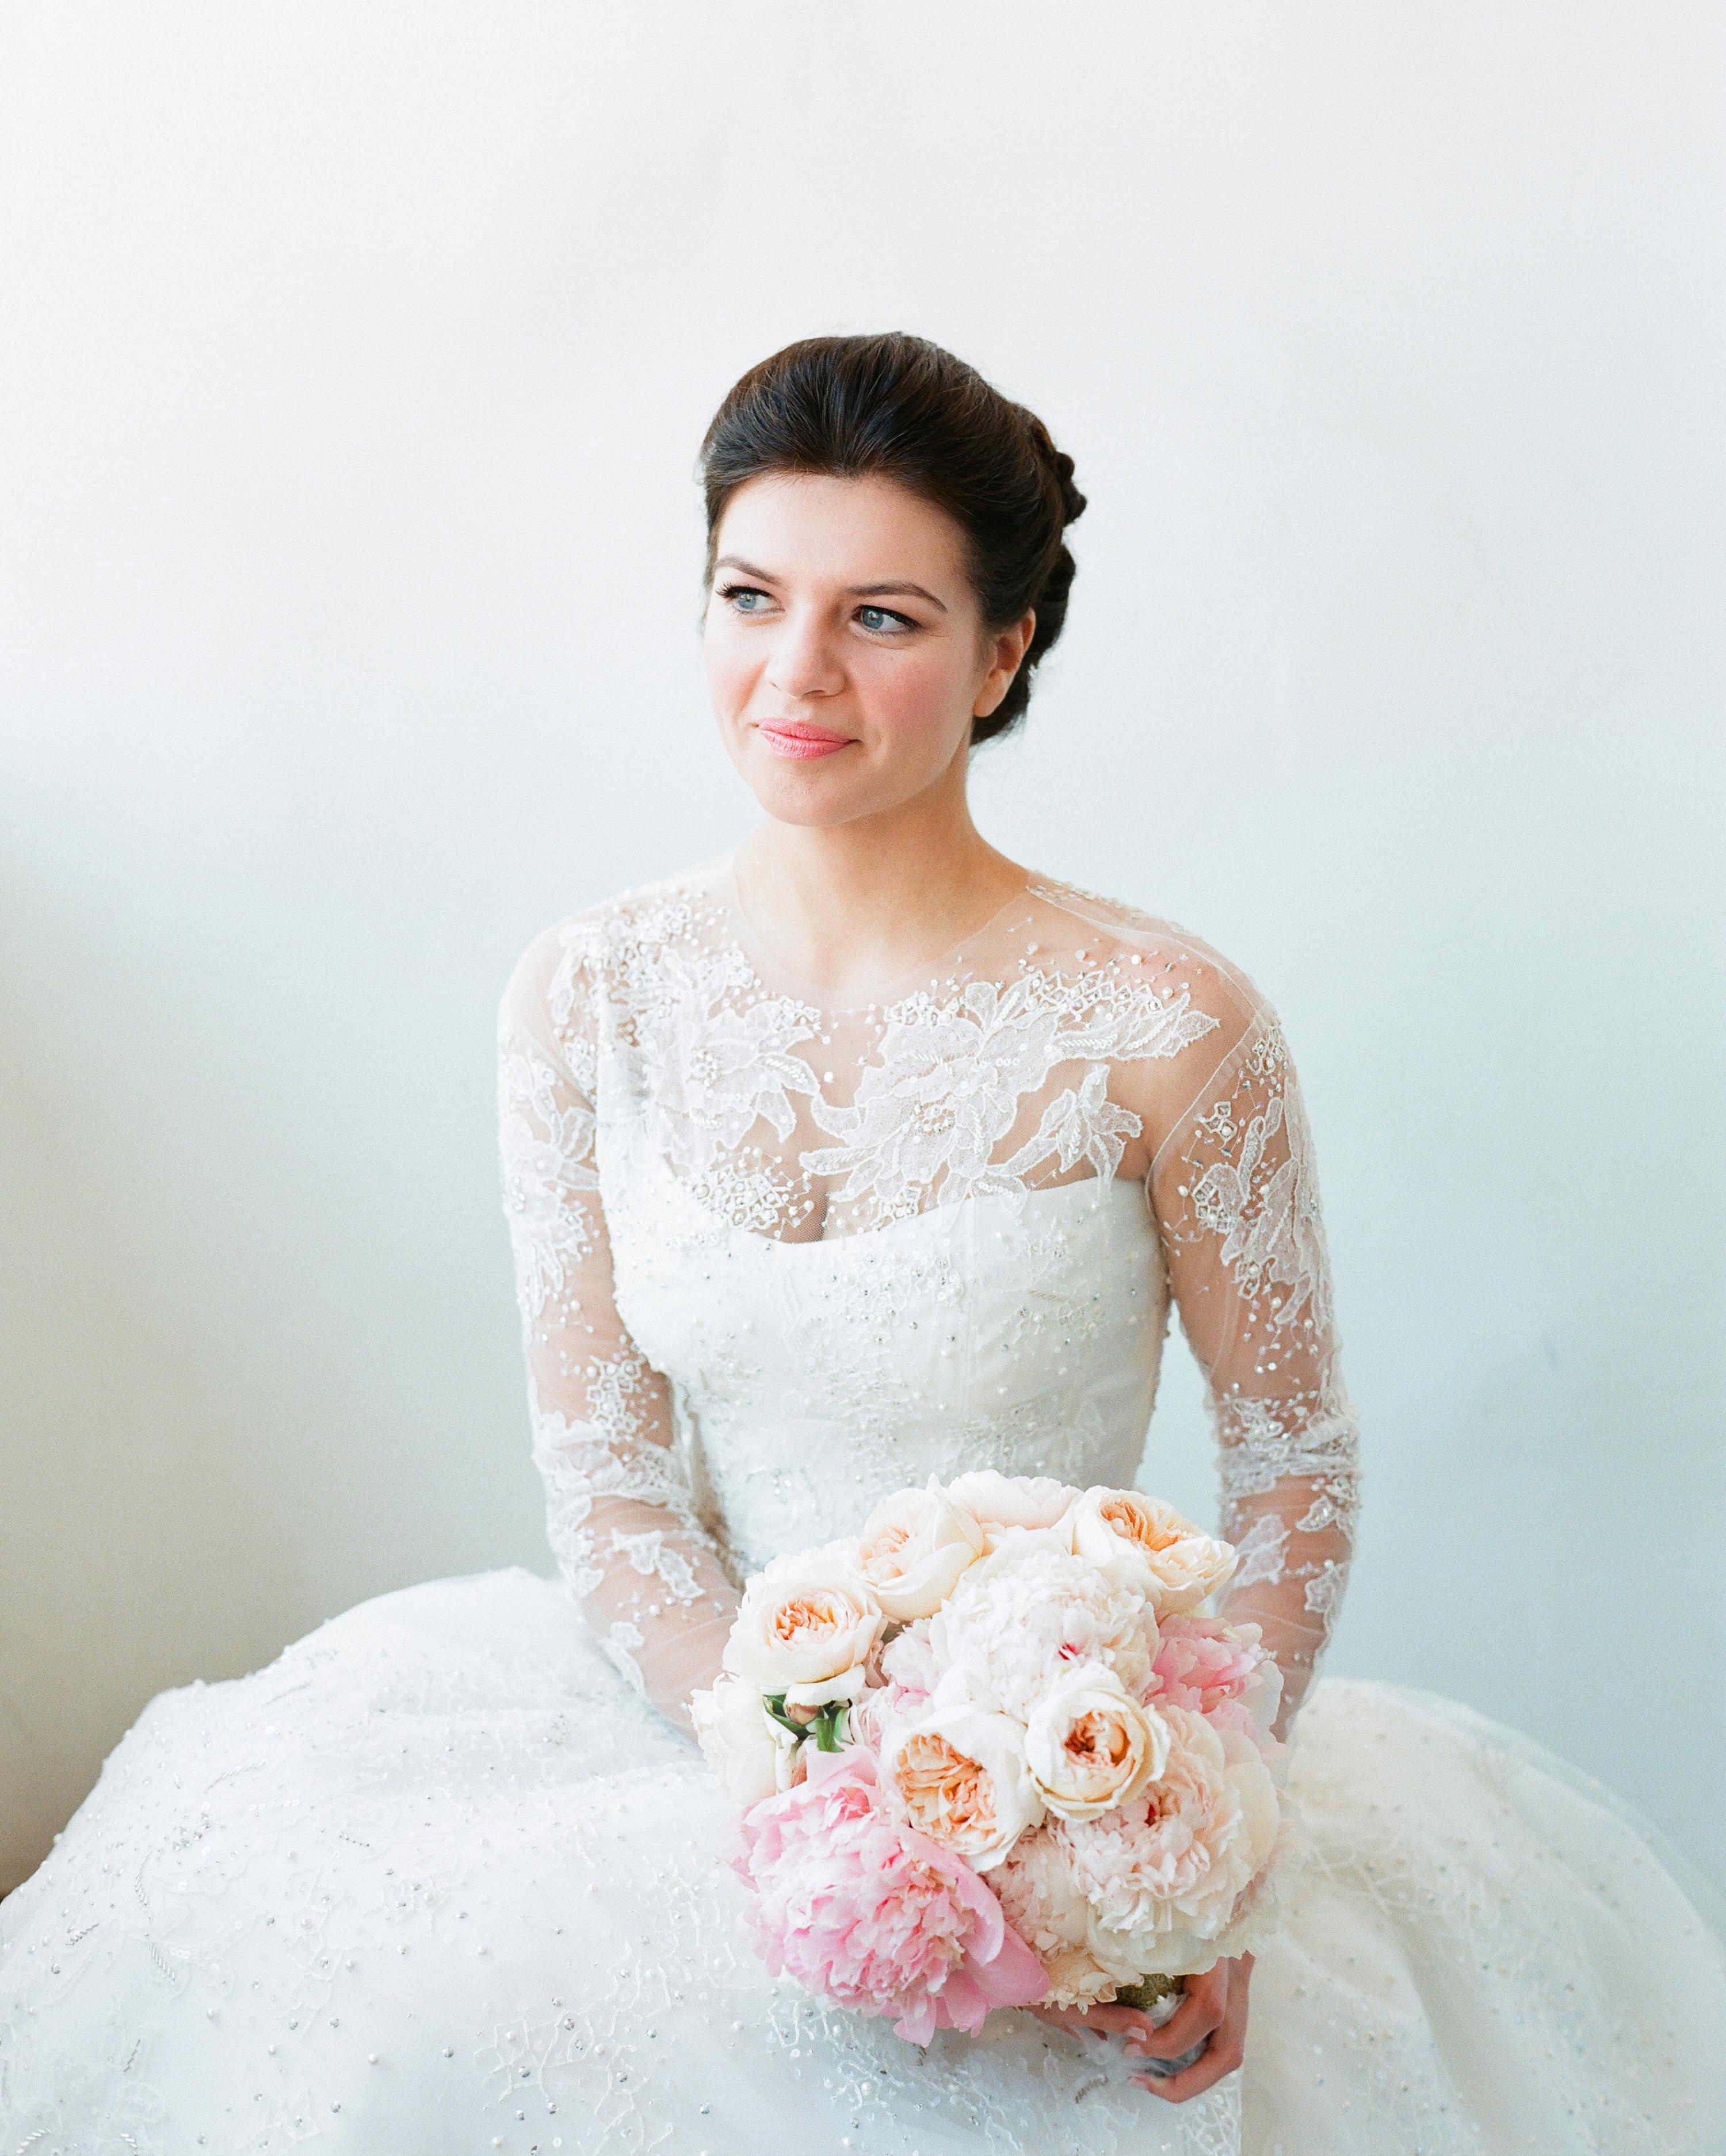 casey-david-wedding-ojai-0109-s111709.jpg